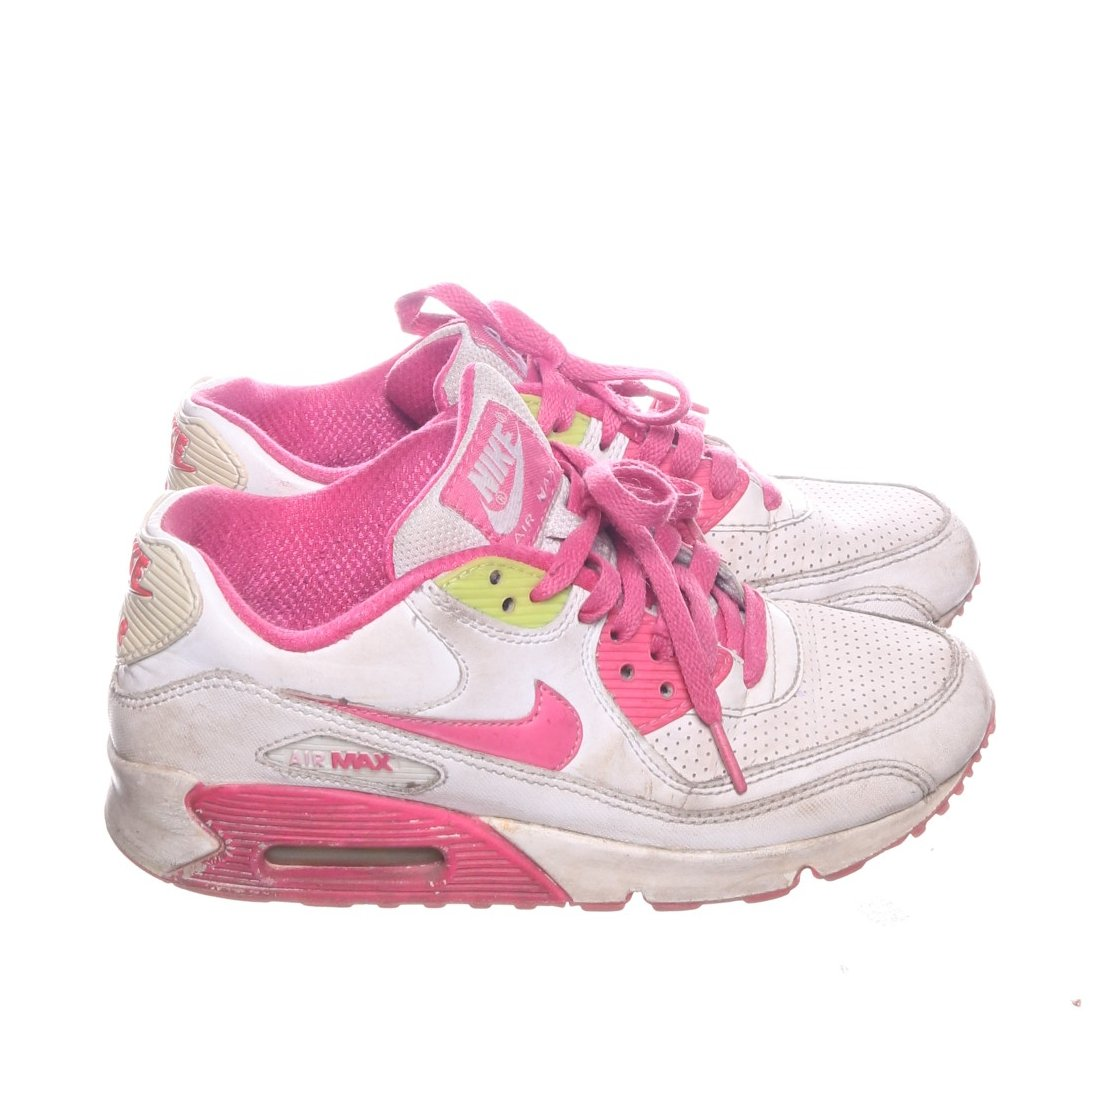 big sale 67d5b 41a66 Nike Air Max, Sneakers, Strl  37,5, Vit Rosa ...